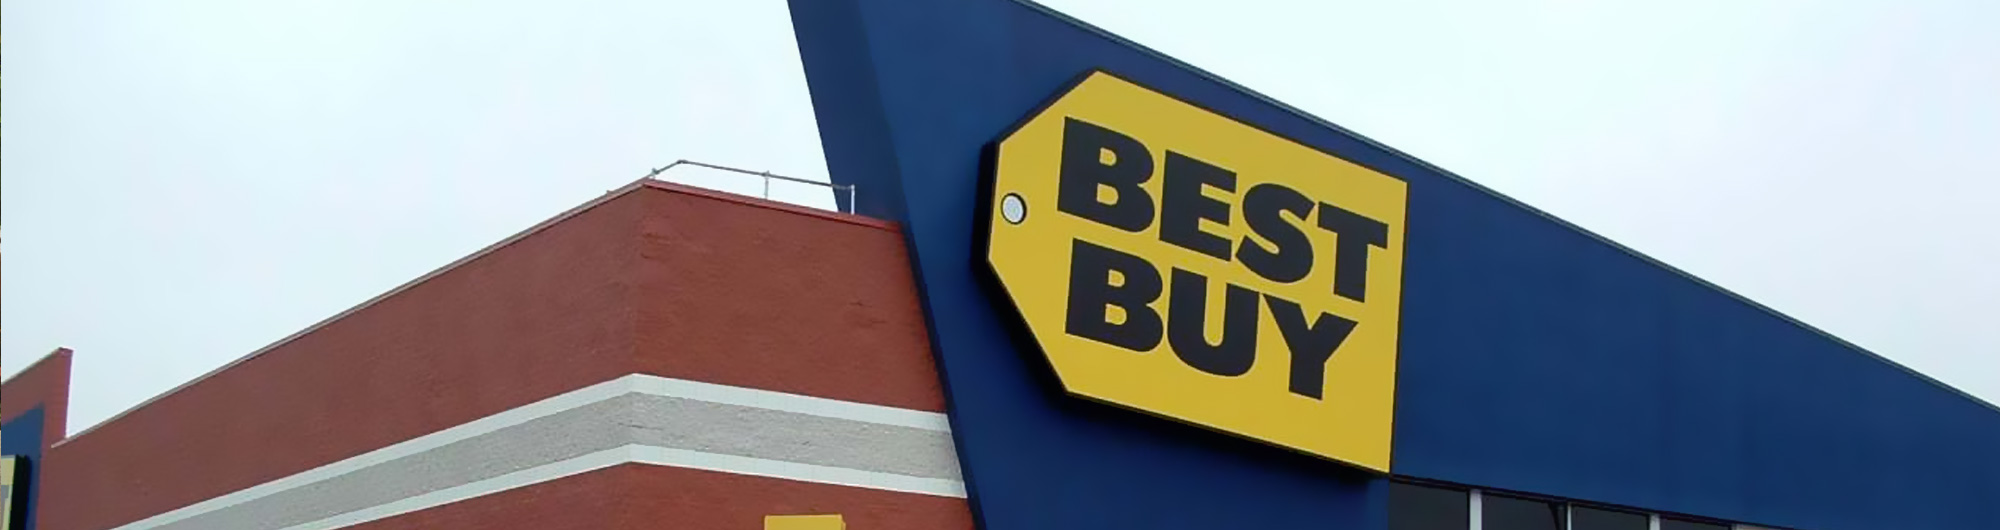 Best Buy Geek Squad vs Fix my PC Store